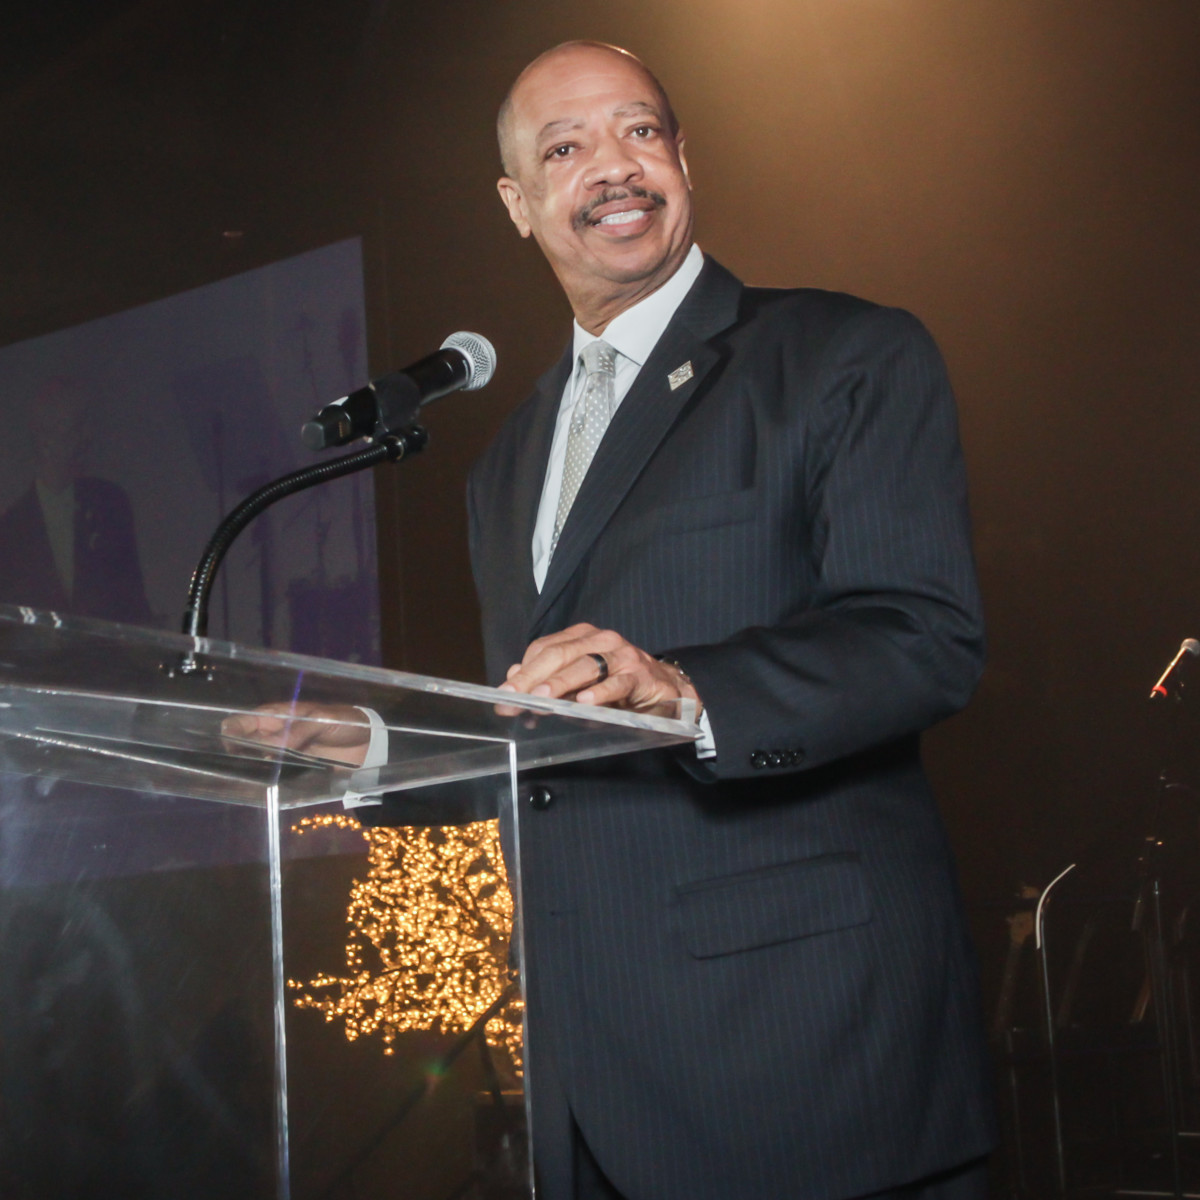 CAMAC 30th anny gala, Jan. 2016, TSU president John M. Rudley